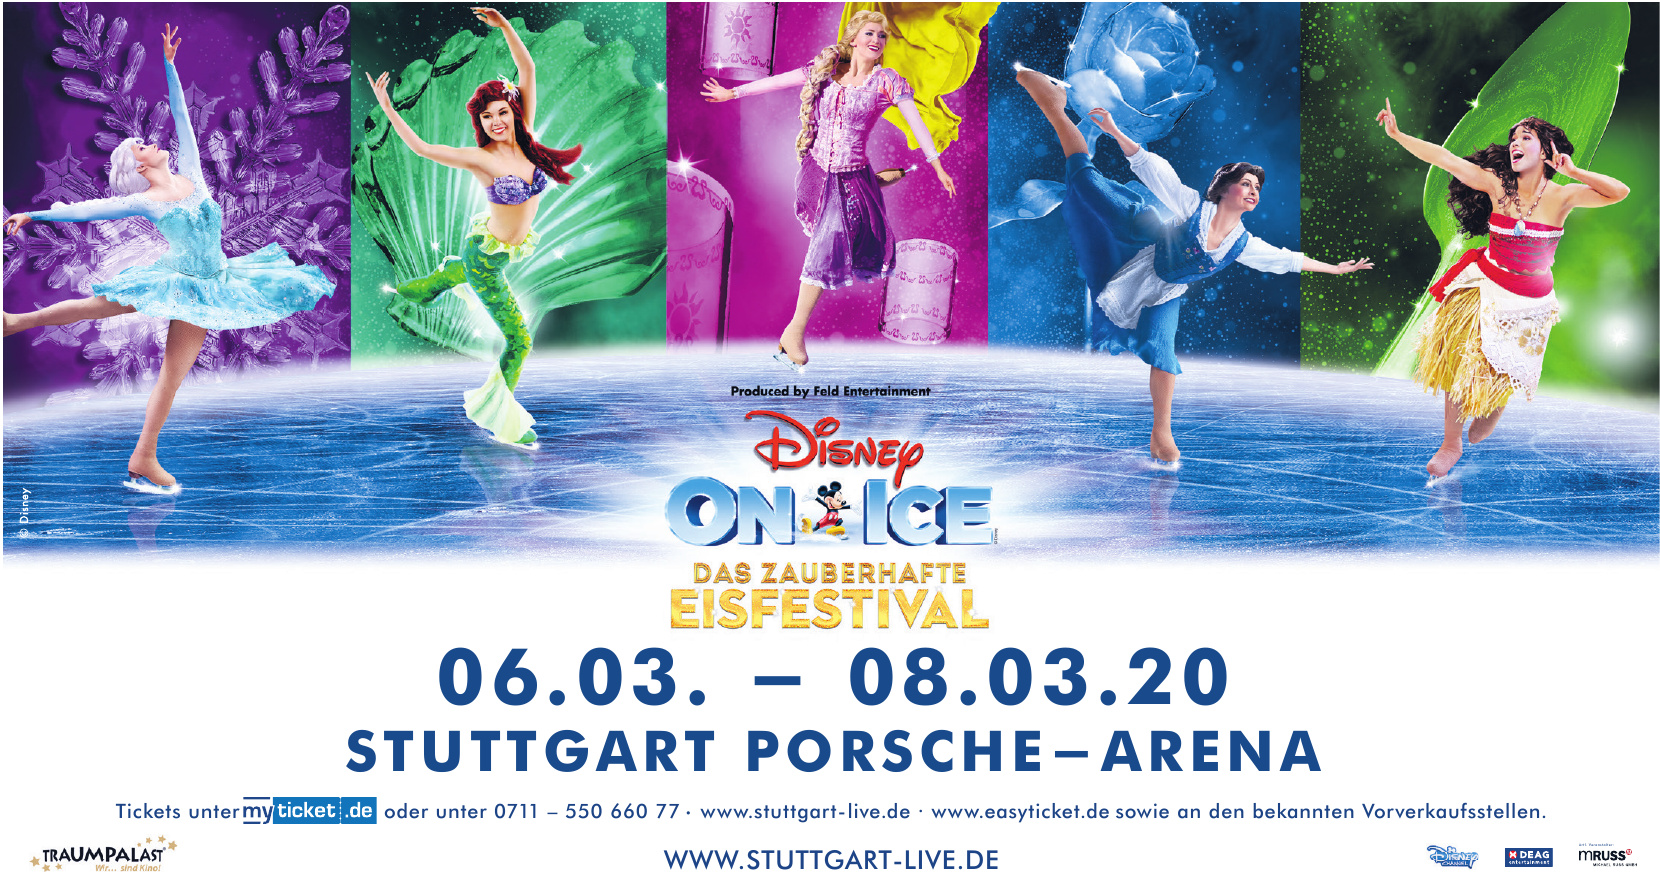 Disney on Ice: Das zauberhafte Eisfestival